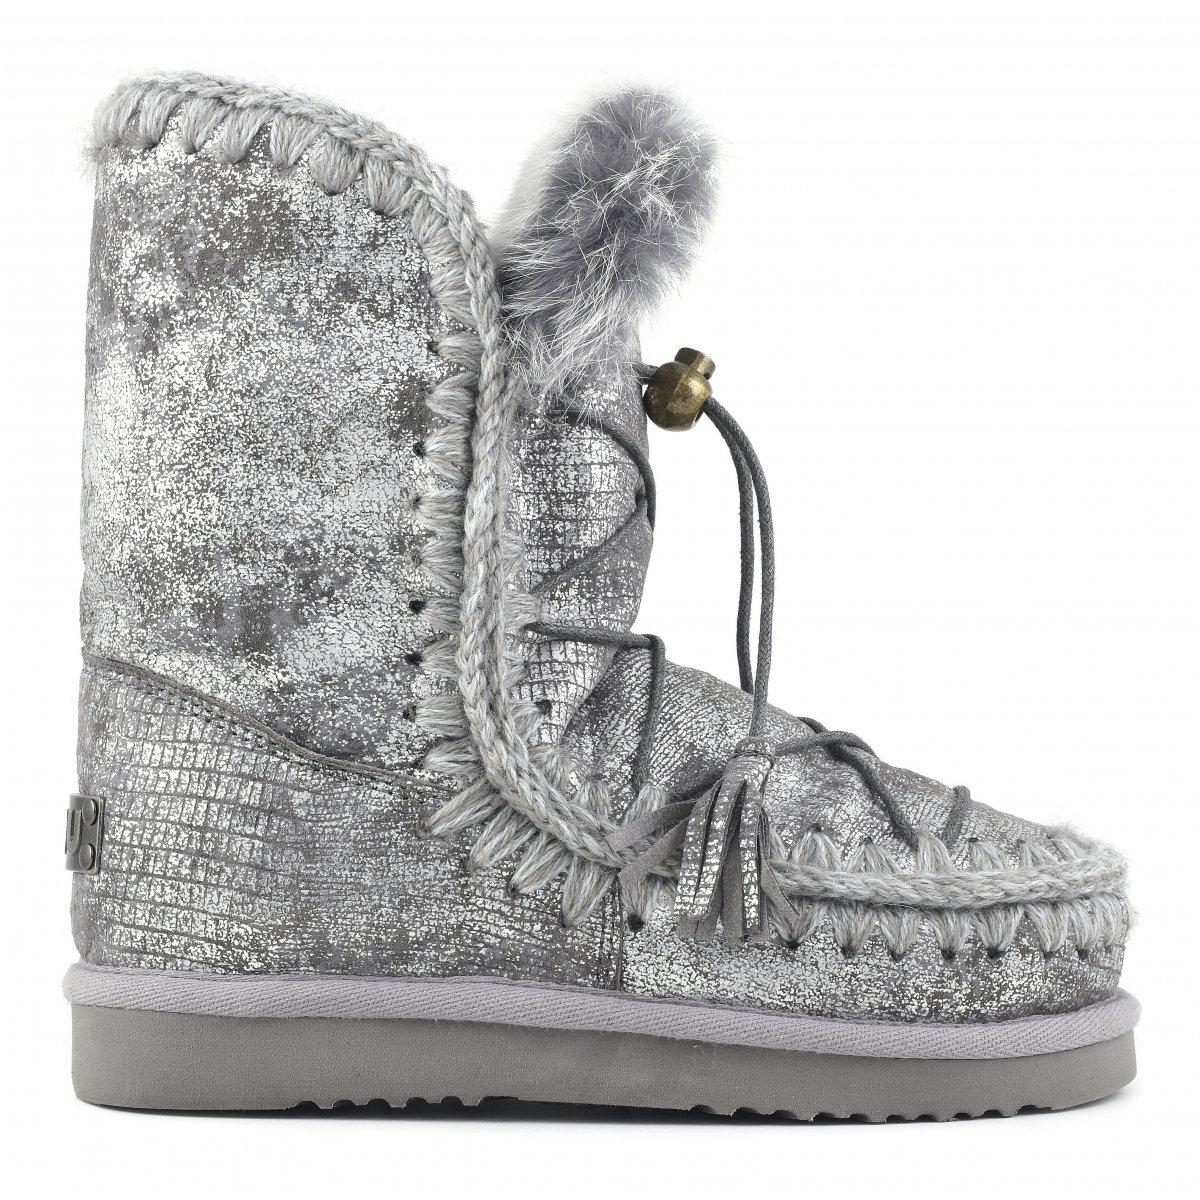 Mou Eskimo Dreamcatcher Boots #ChristmasSale   Boots